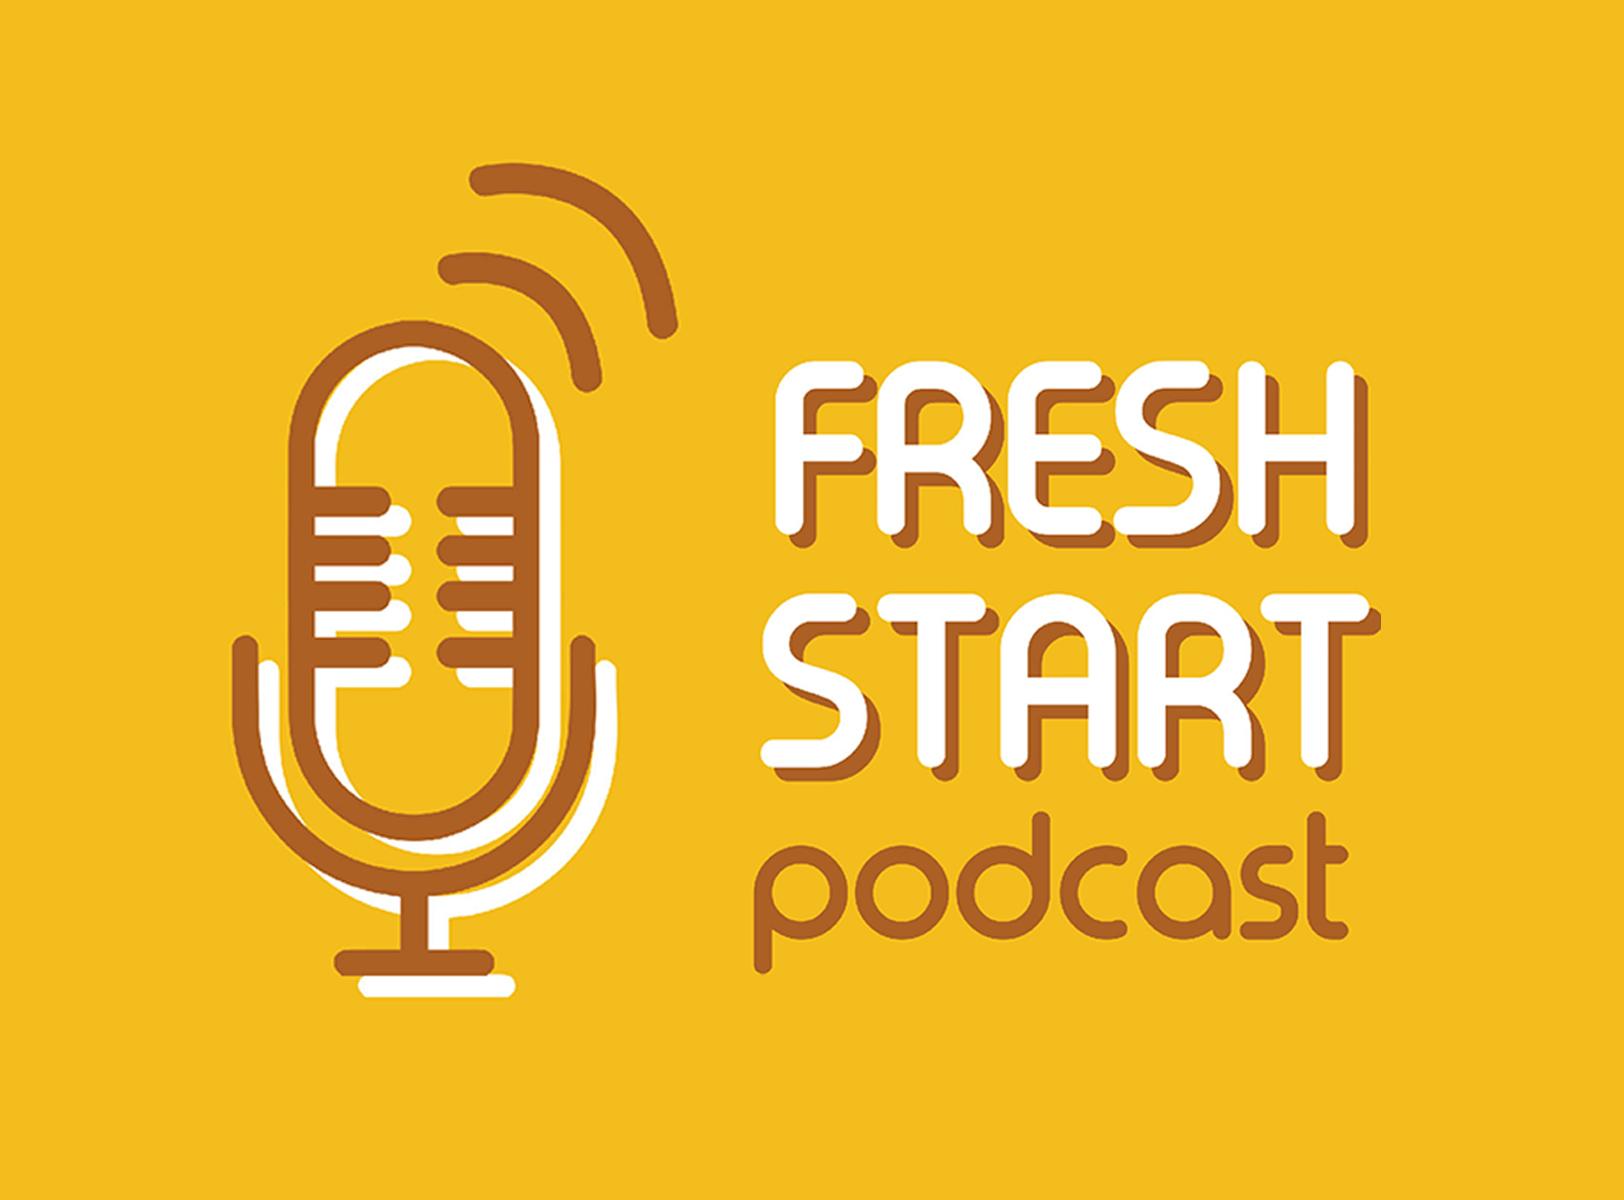 Fresh Start: Podcast News (2/21/2019 Thu.)